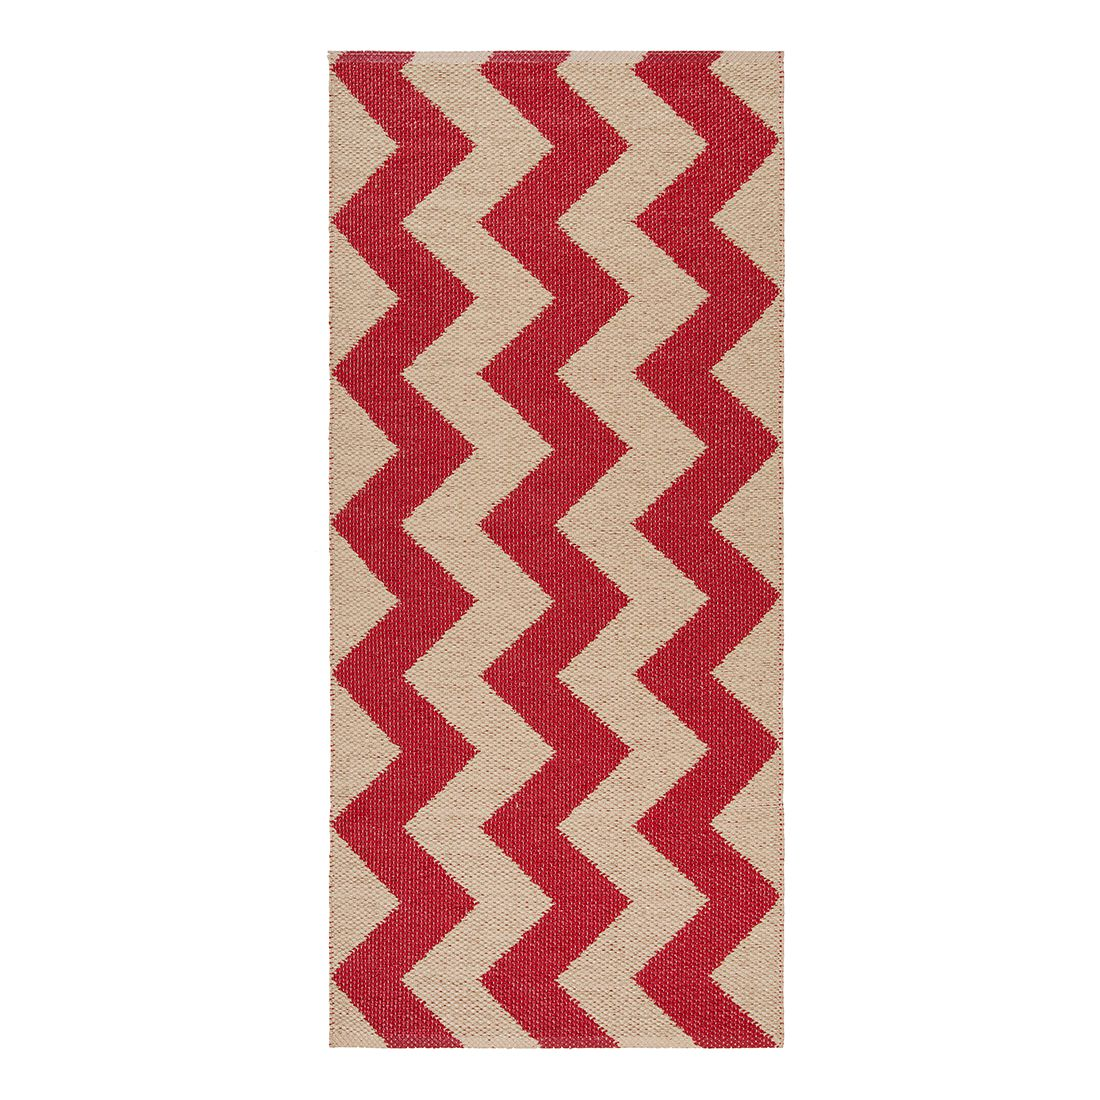 in outdoorteppich mora i kunstfaser rot beige 60 x 200 cm swedy g nstig kaufen. Black Bedroom Furniture Sets. Home Design Ideas